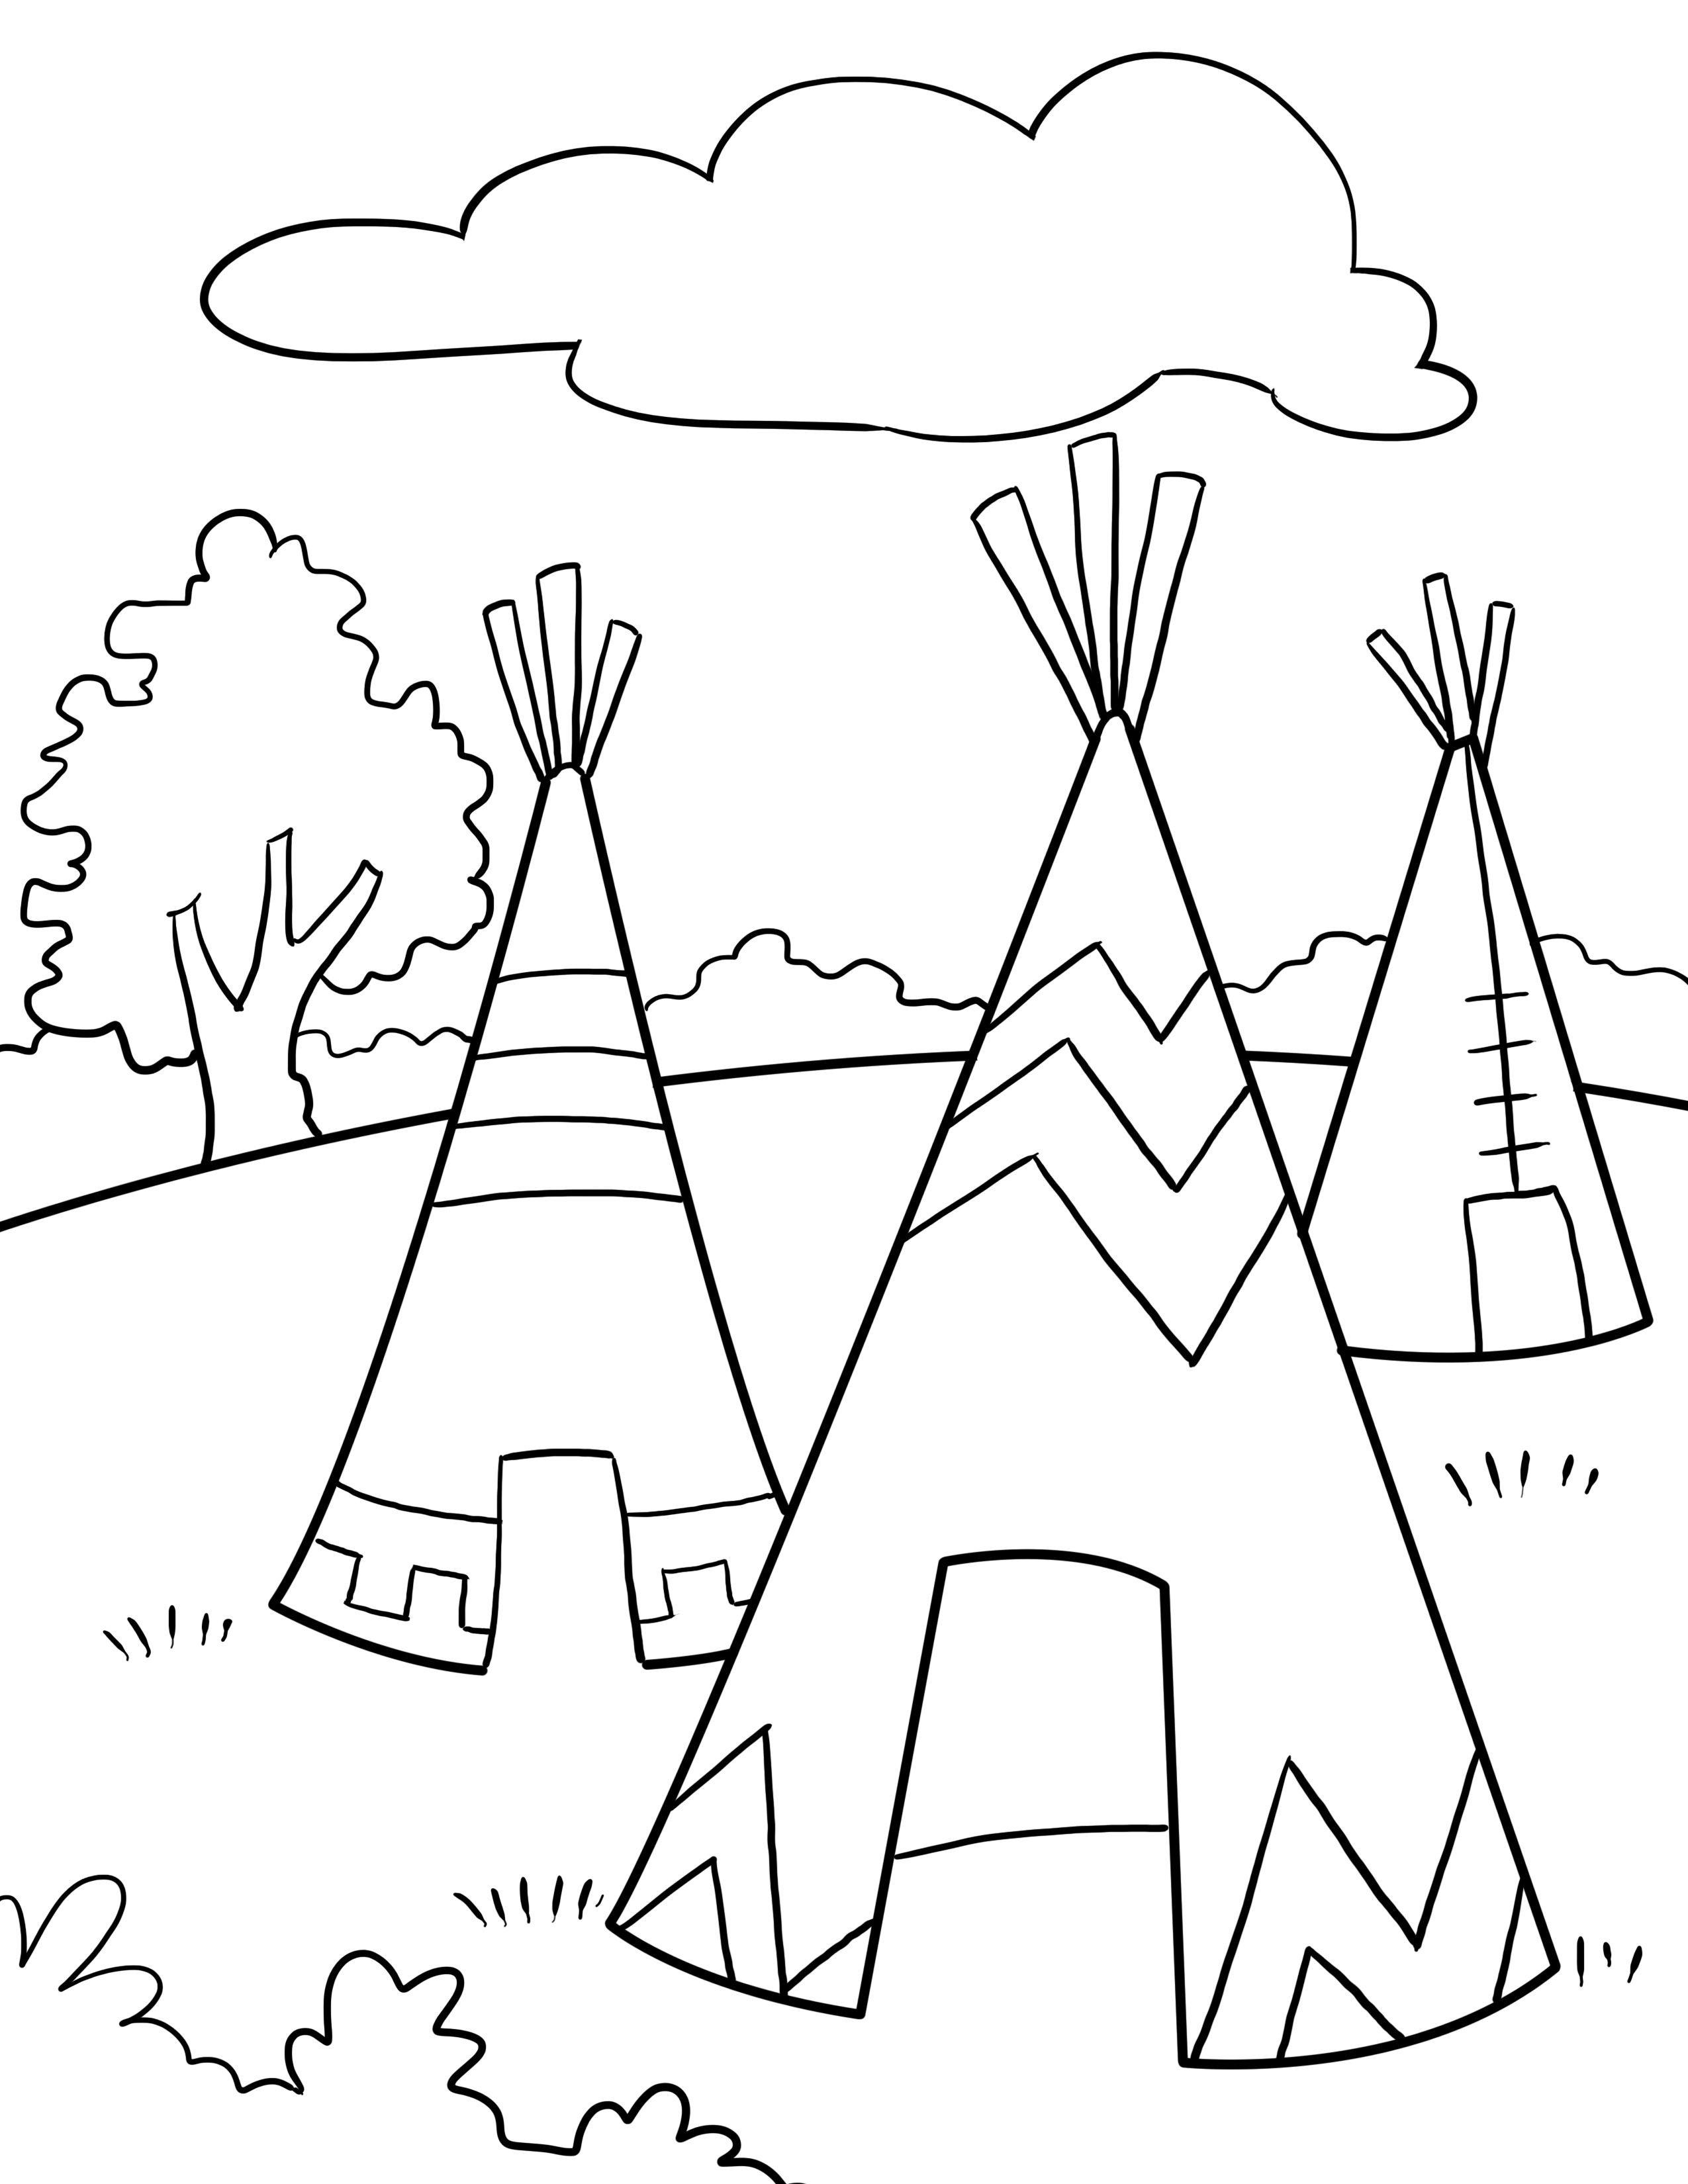 Worksheet Native American Lessons